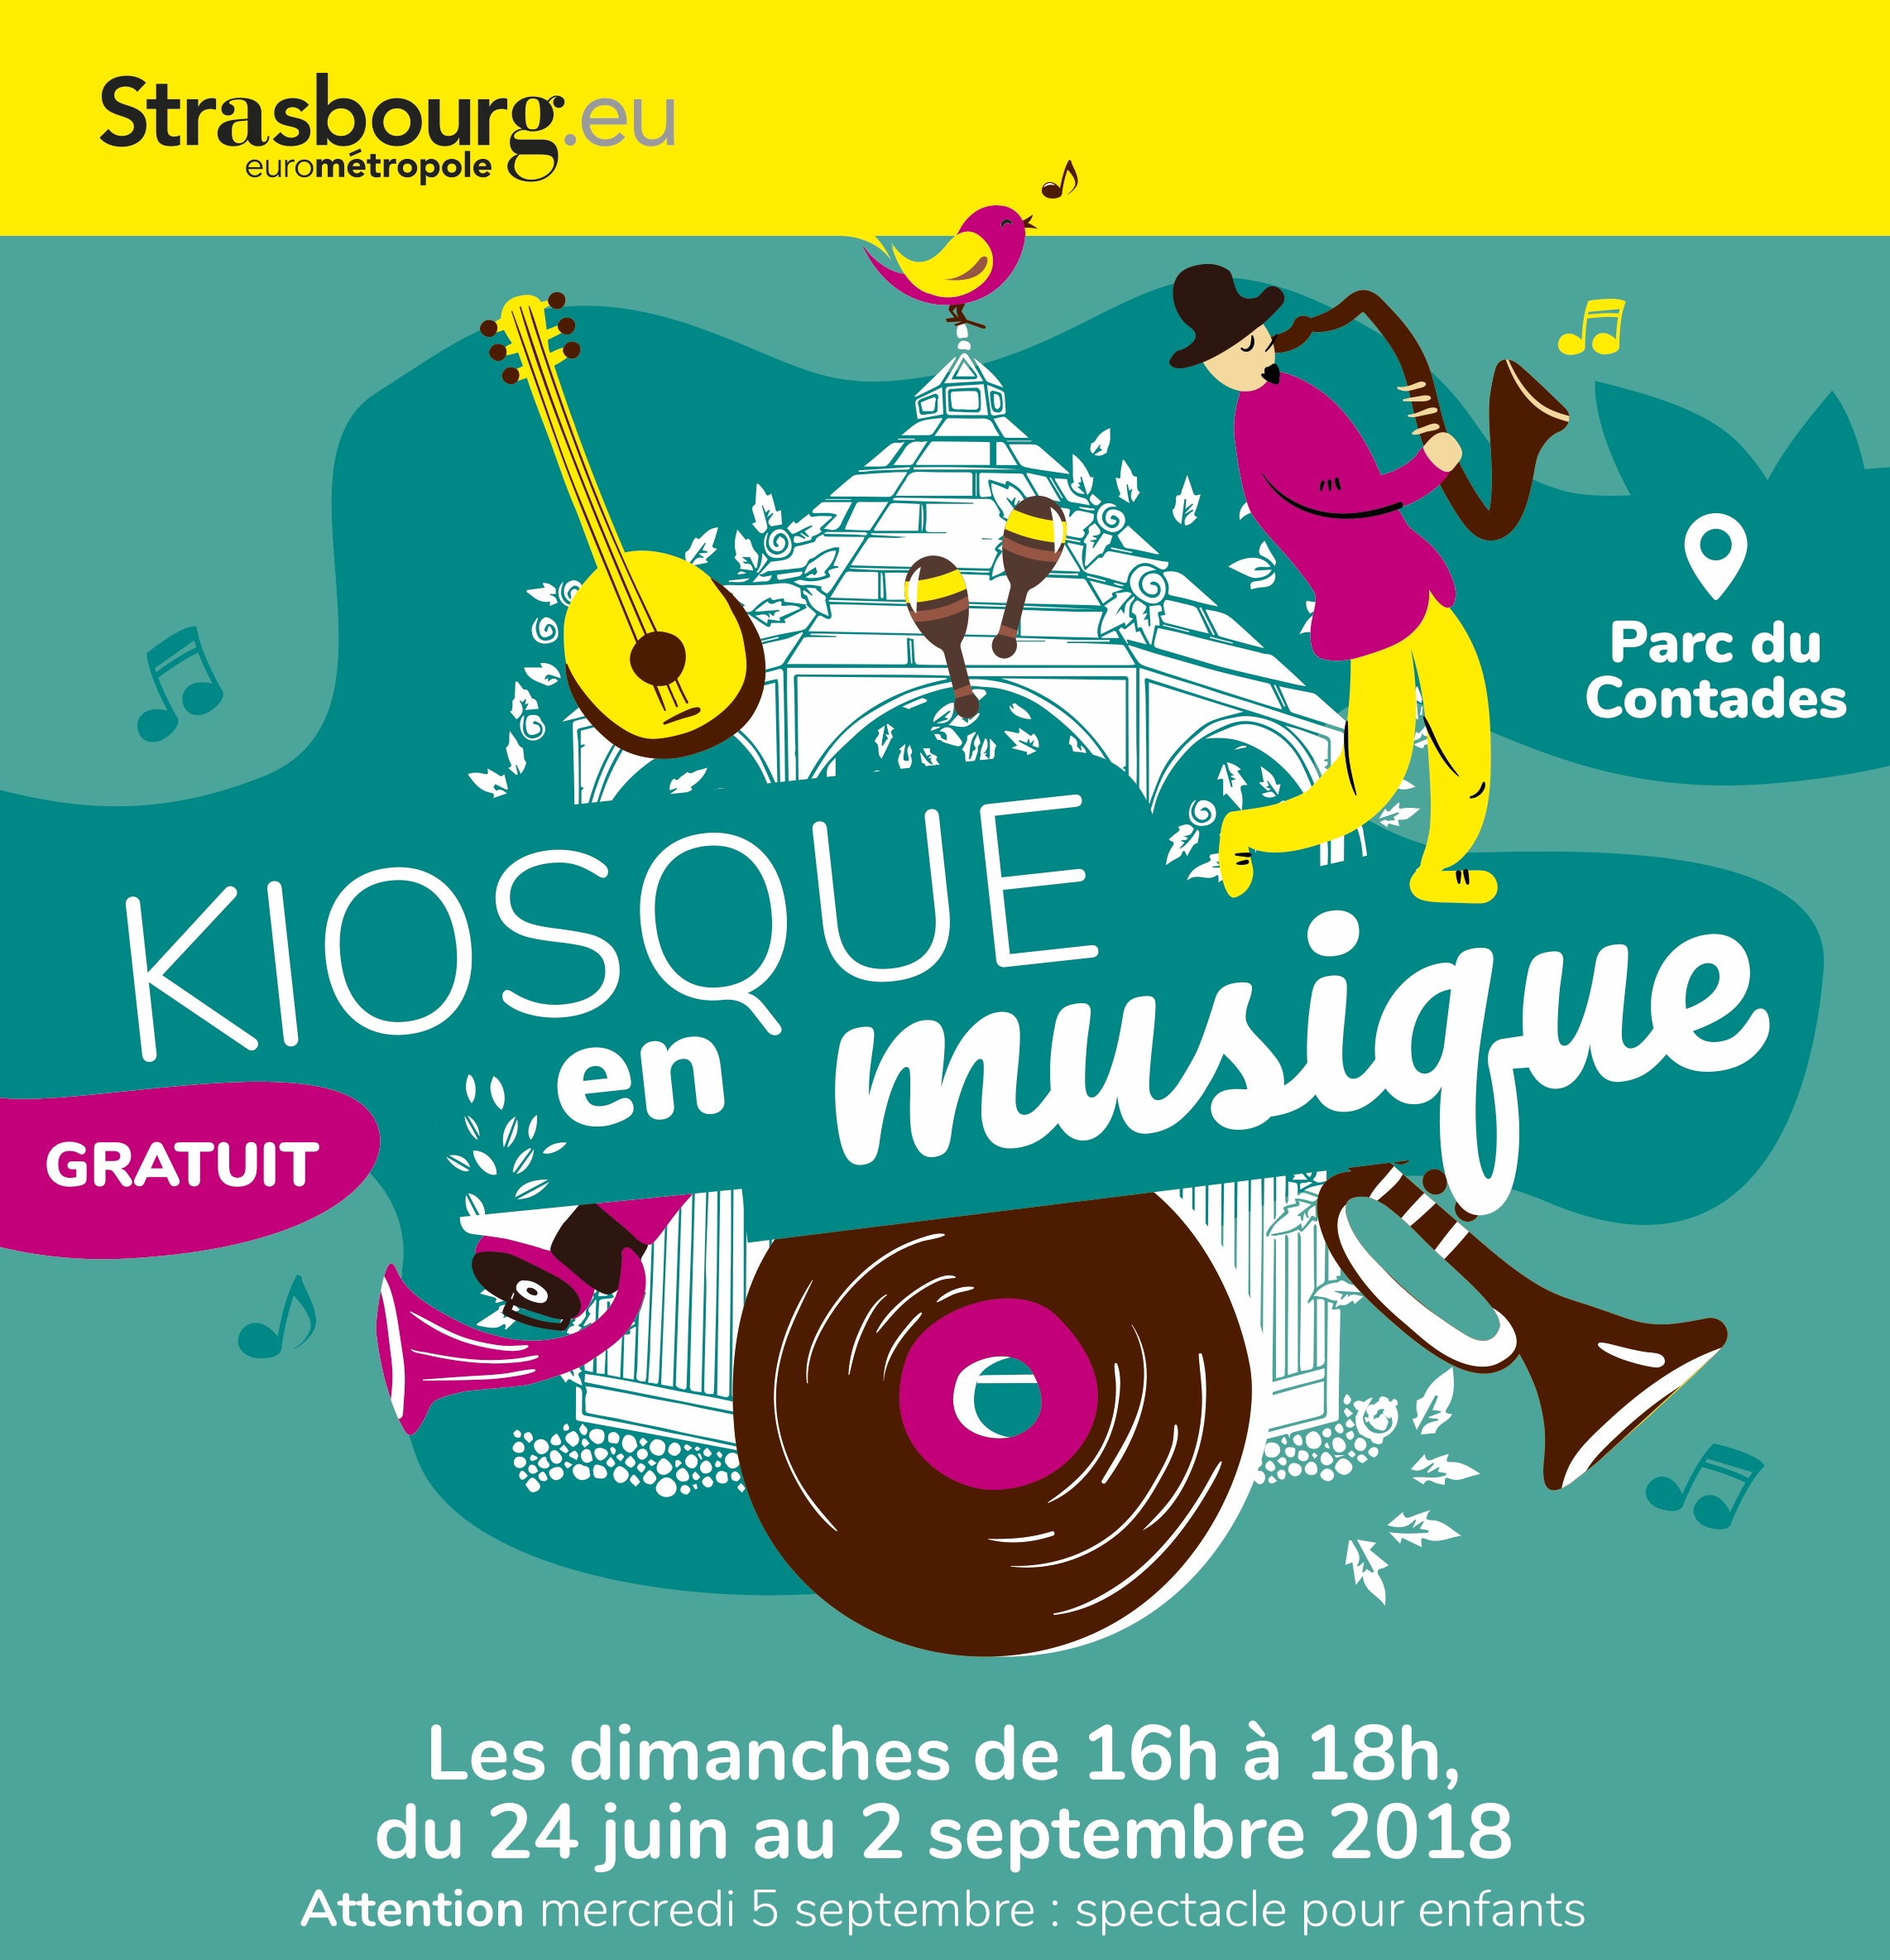 affiche-kiosque-musique-strasbourg